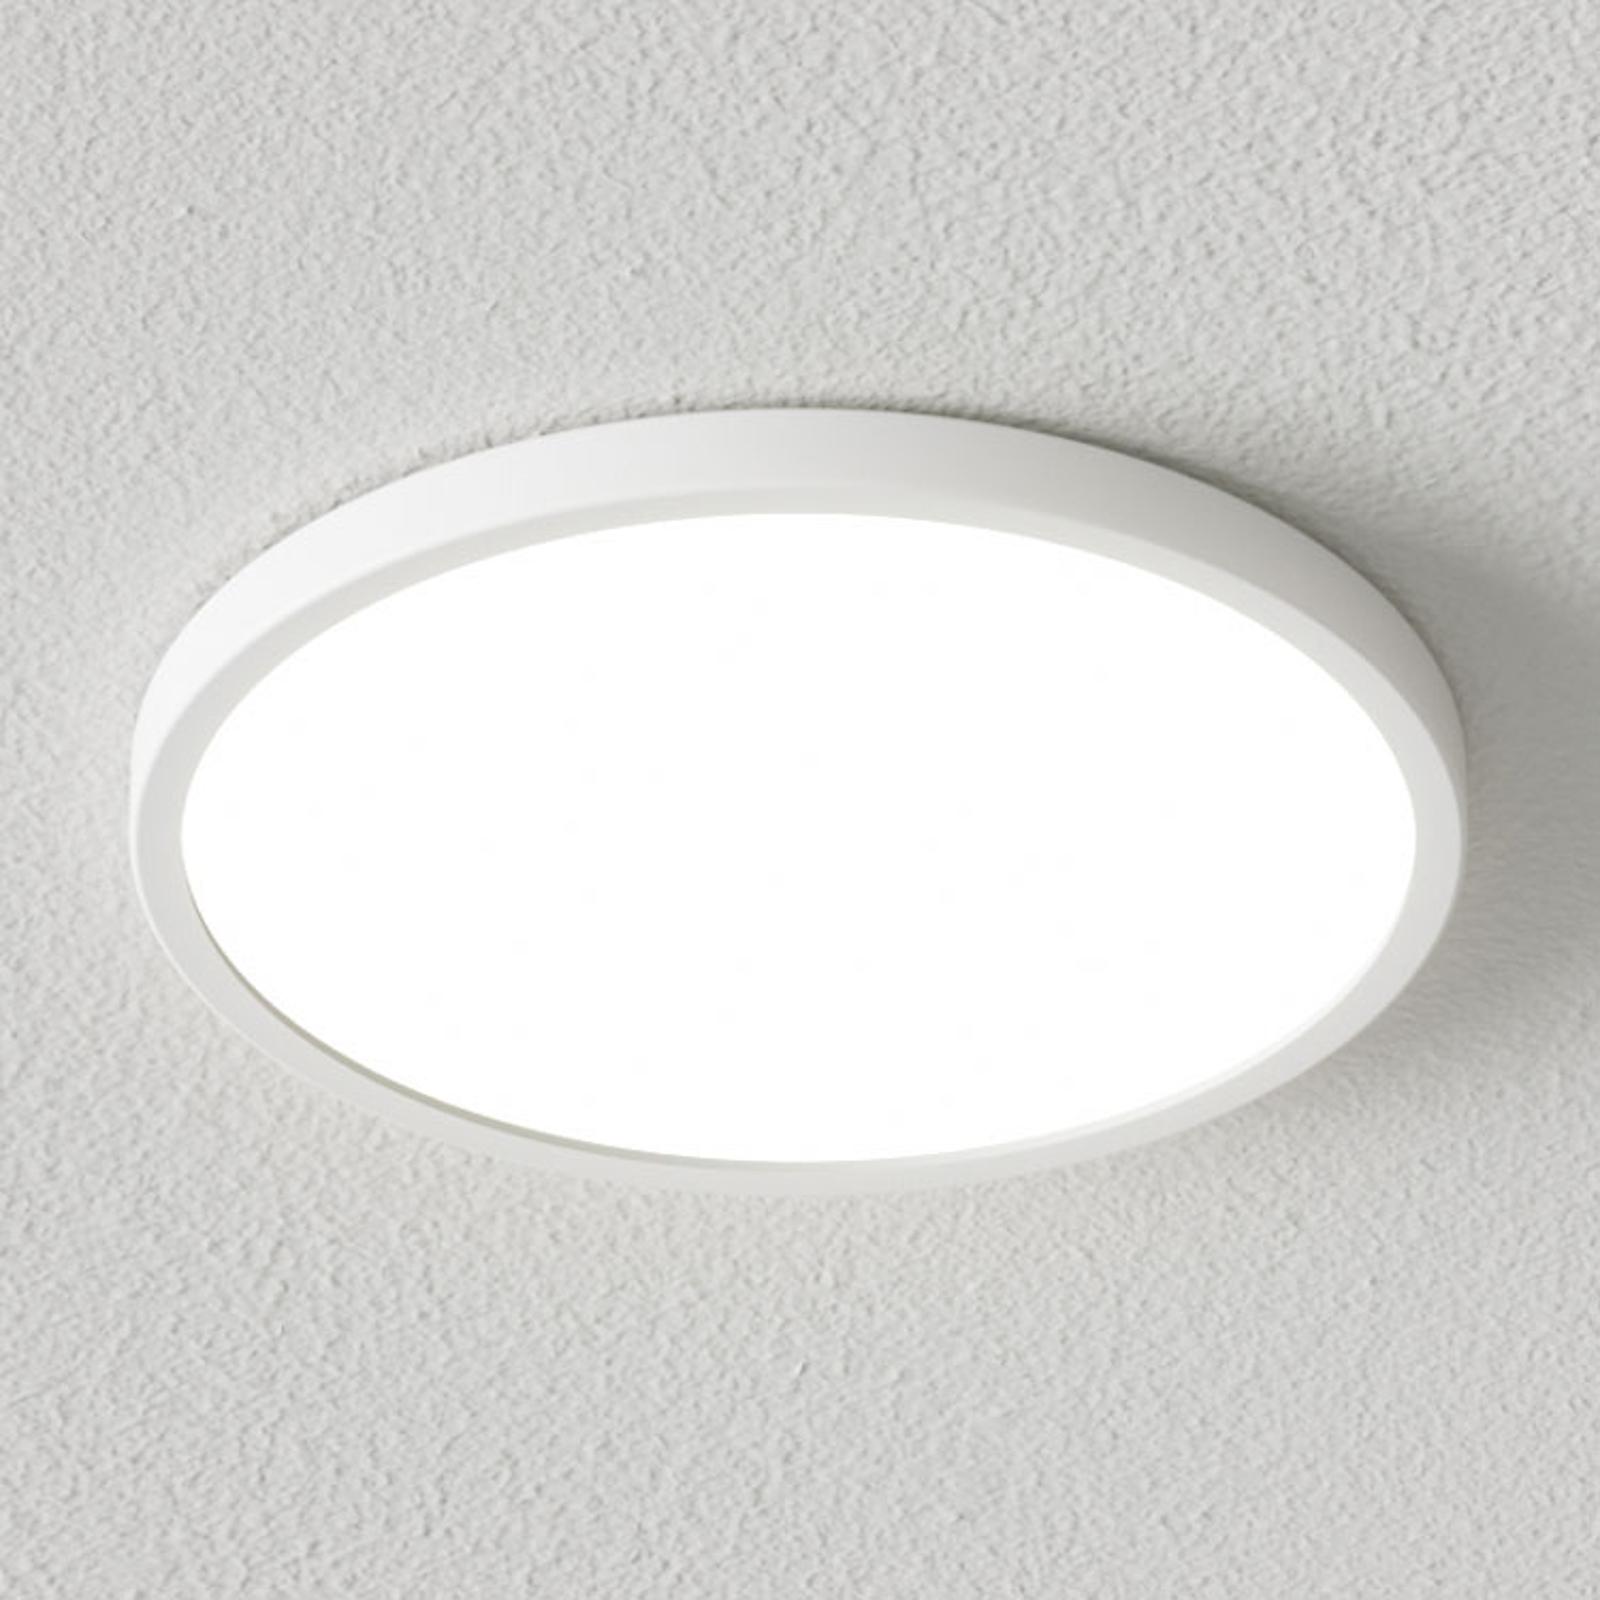 Dimmbare LED-Deckenlampe Solvie in Weiß